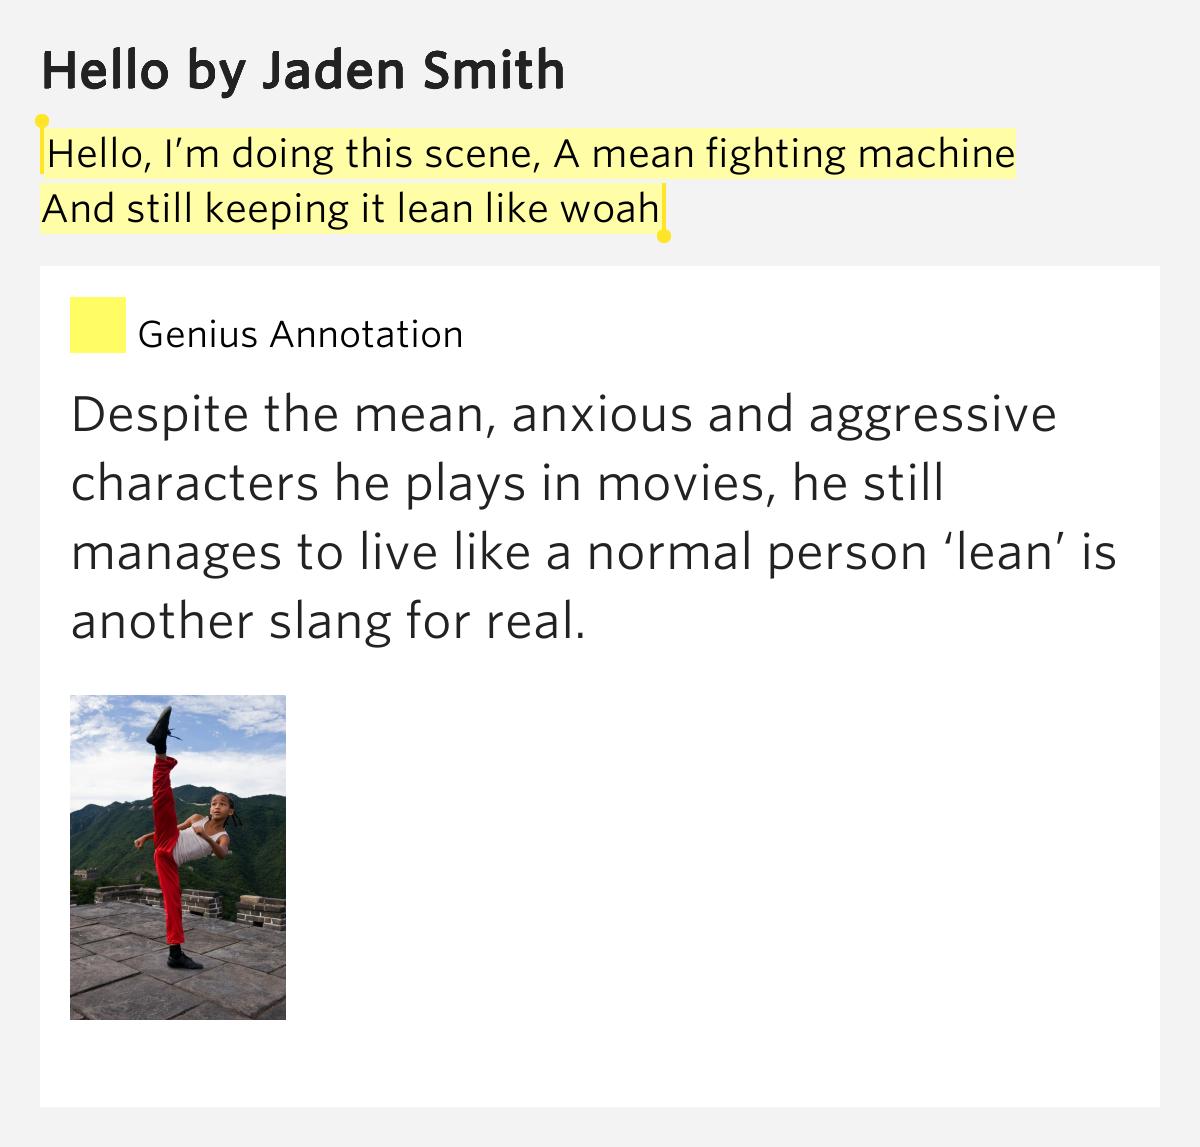 lean fighting machine quote